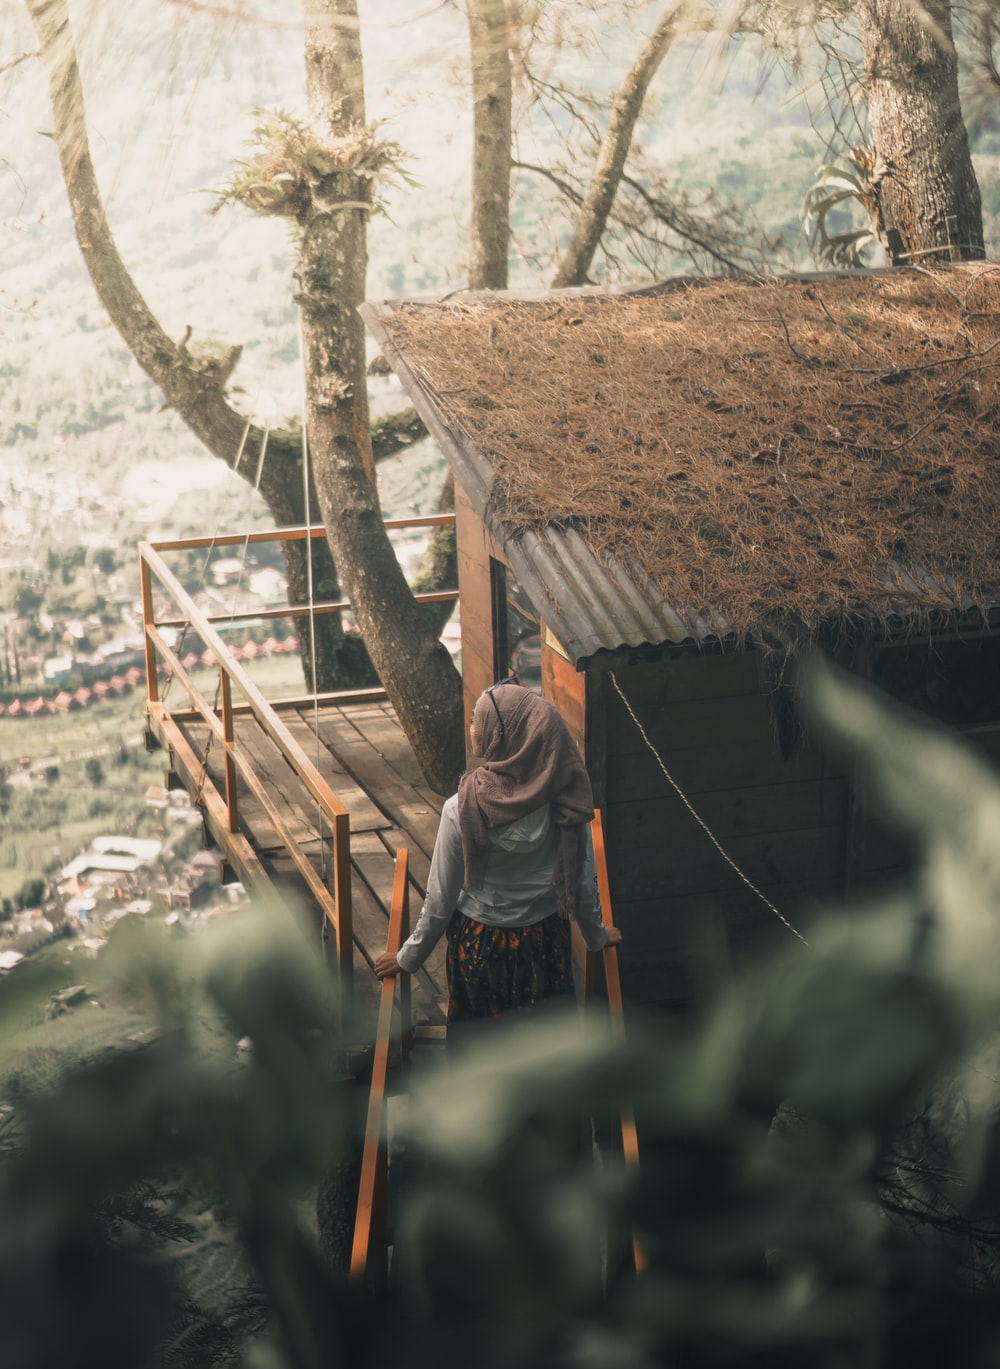 woman wearing hijab standing beside house